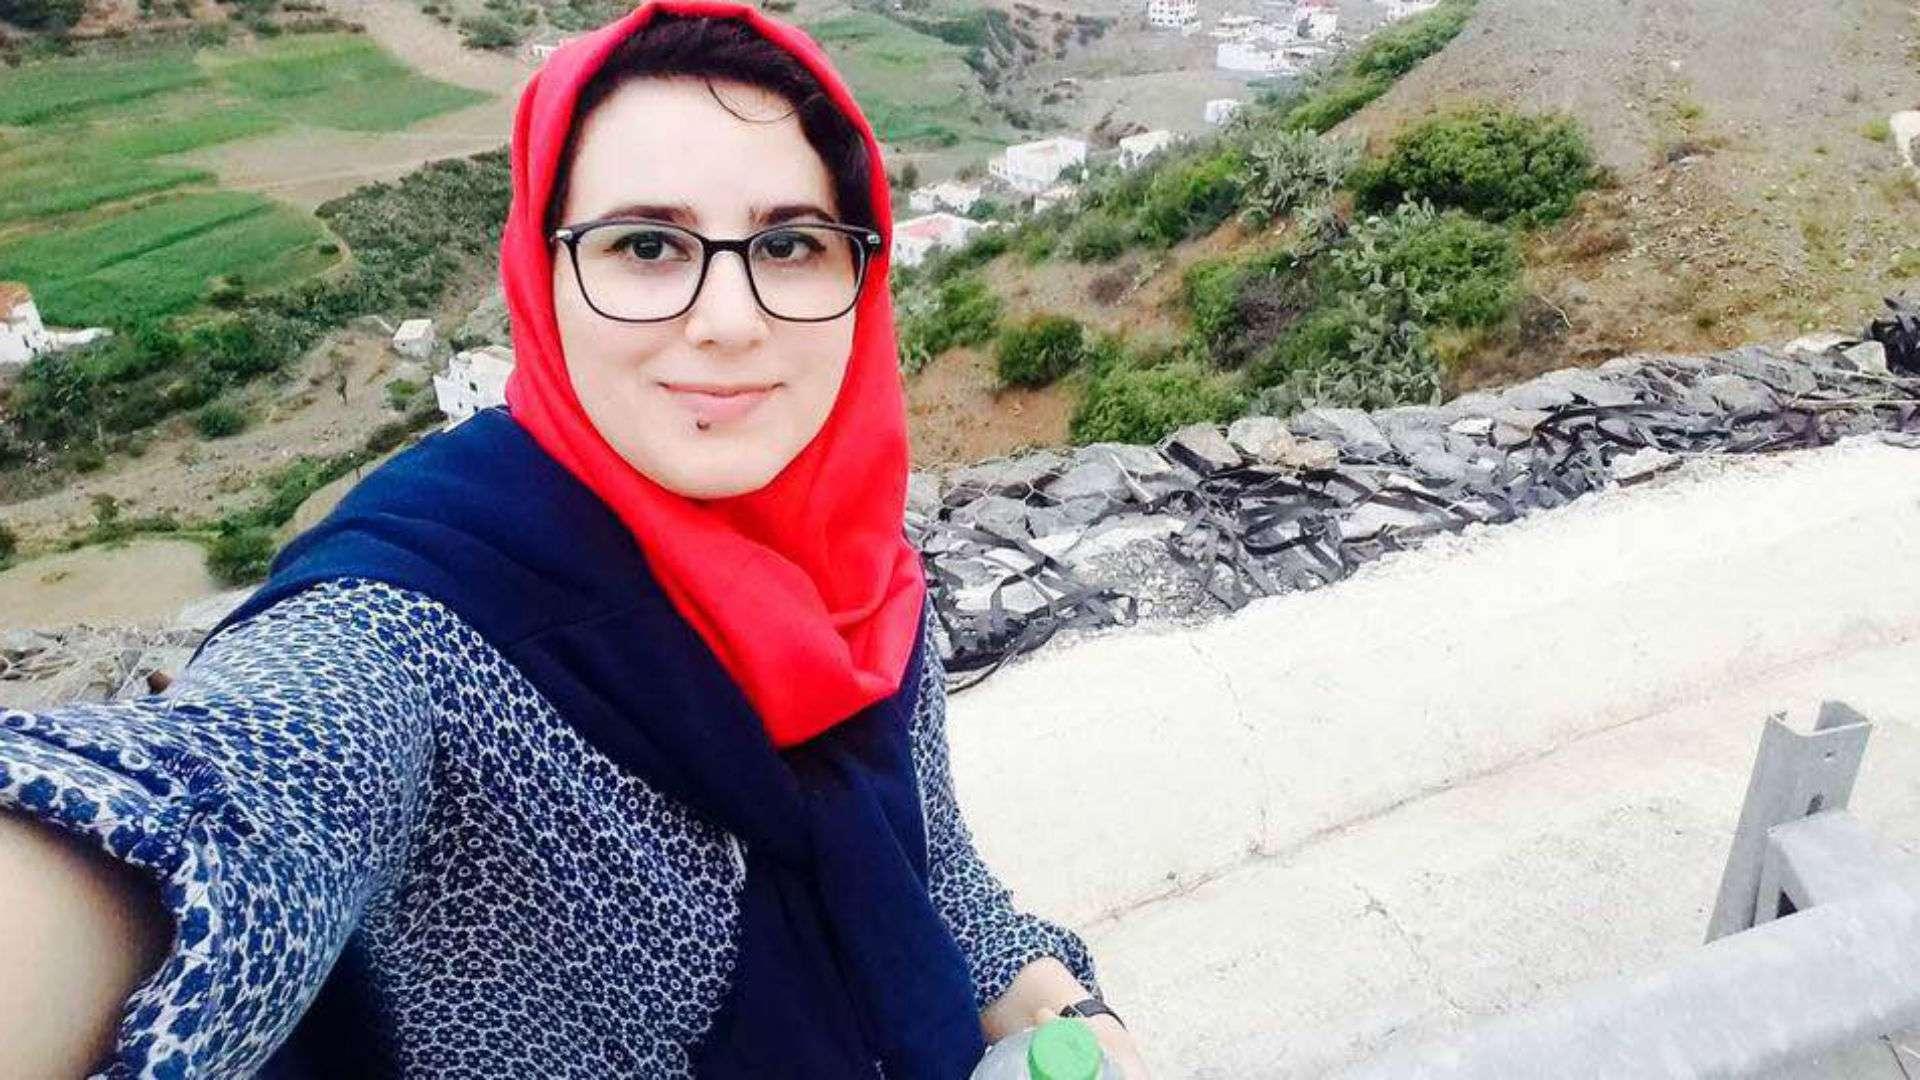 L'arrestation de la journaliste marocaine Hajar Rissouni manque de fondement juridique